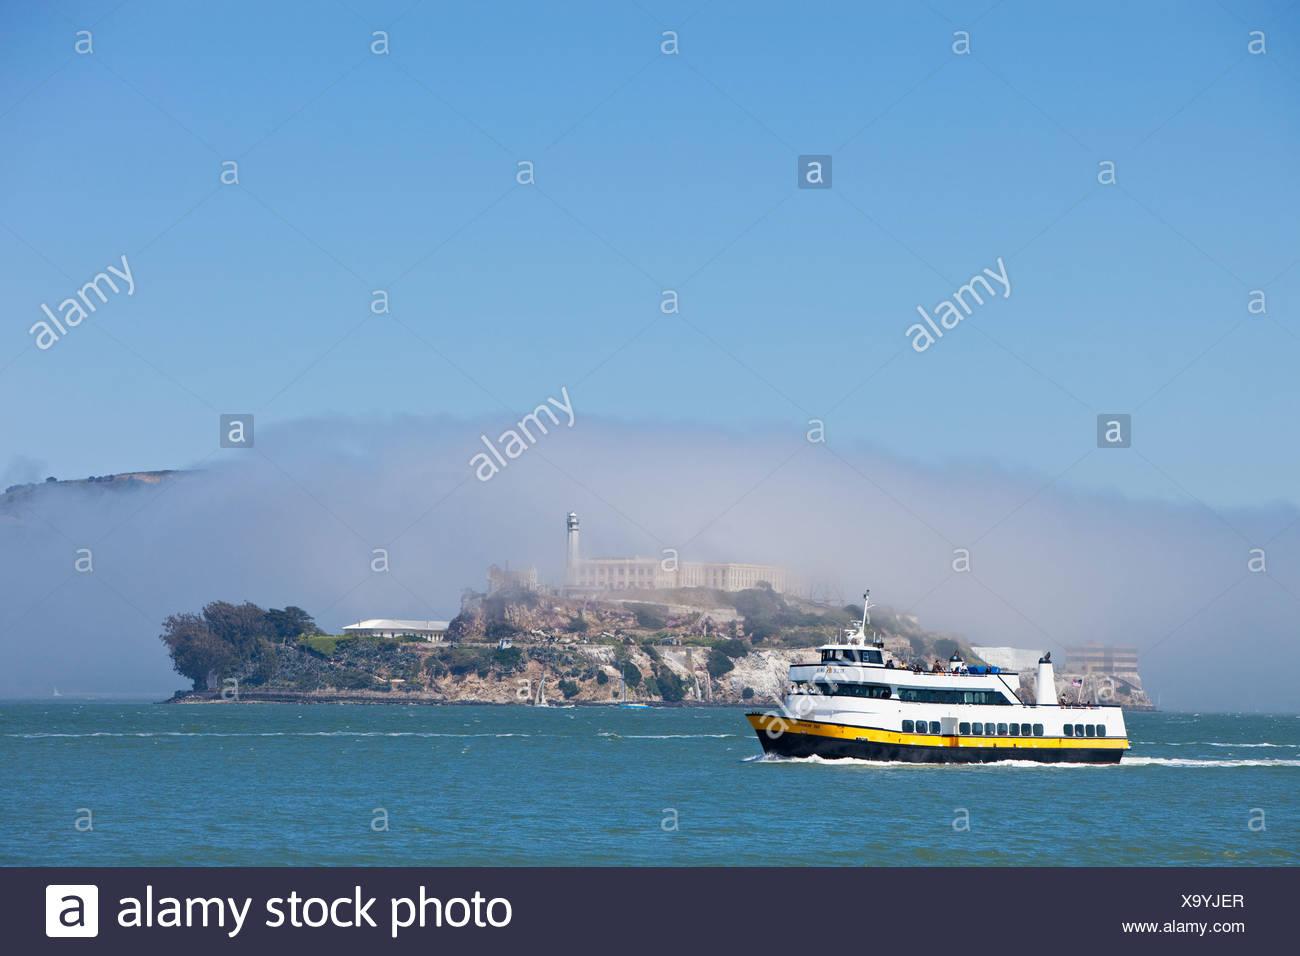 Excursion boat with Alcatraz and fog, former prison island, San Francisco, California, USA, America - Stock Image